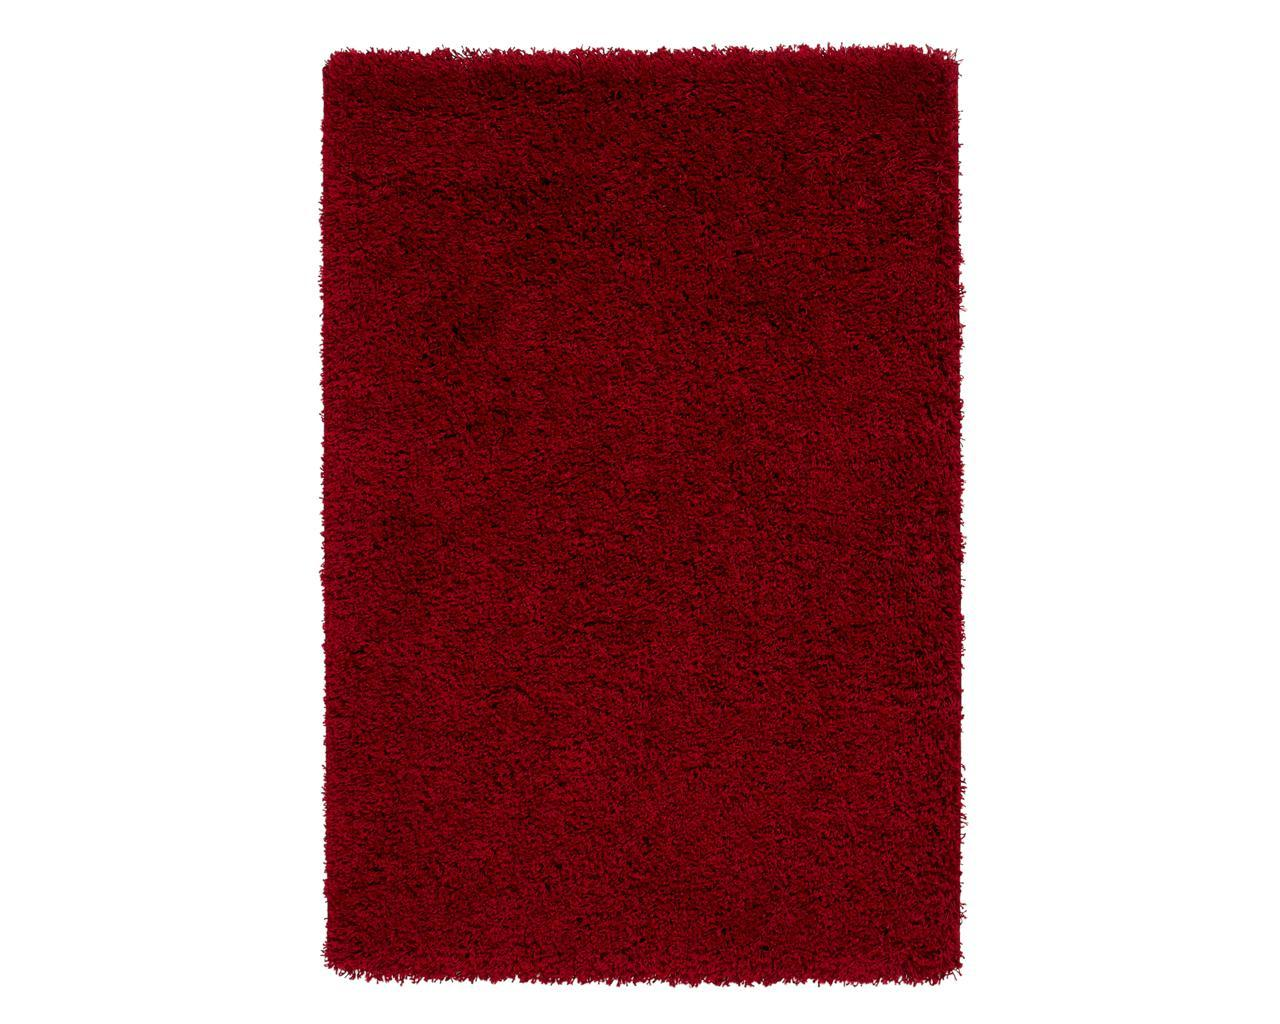 Covor Vista Red 80x150 cm - Think Rugs, Rosu